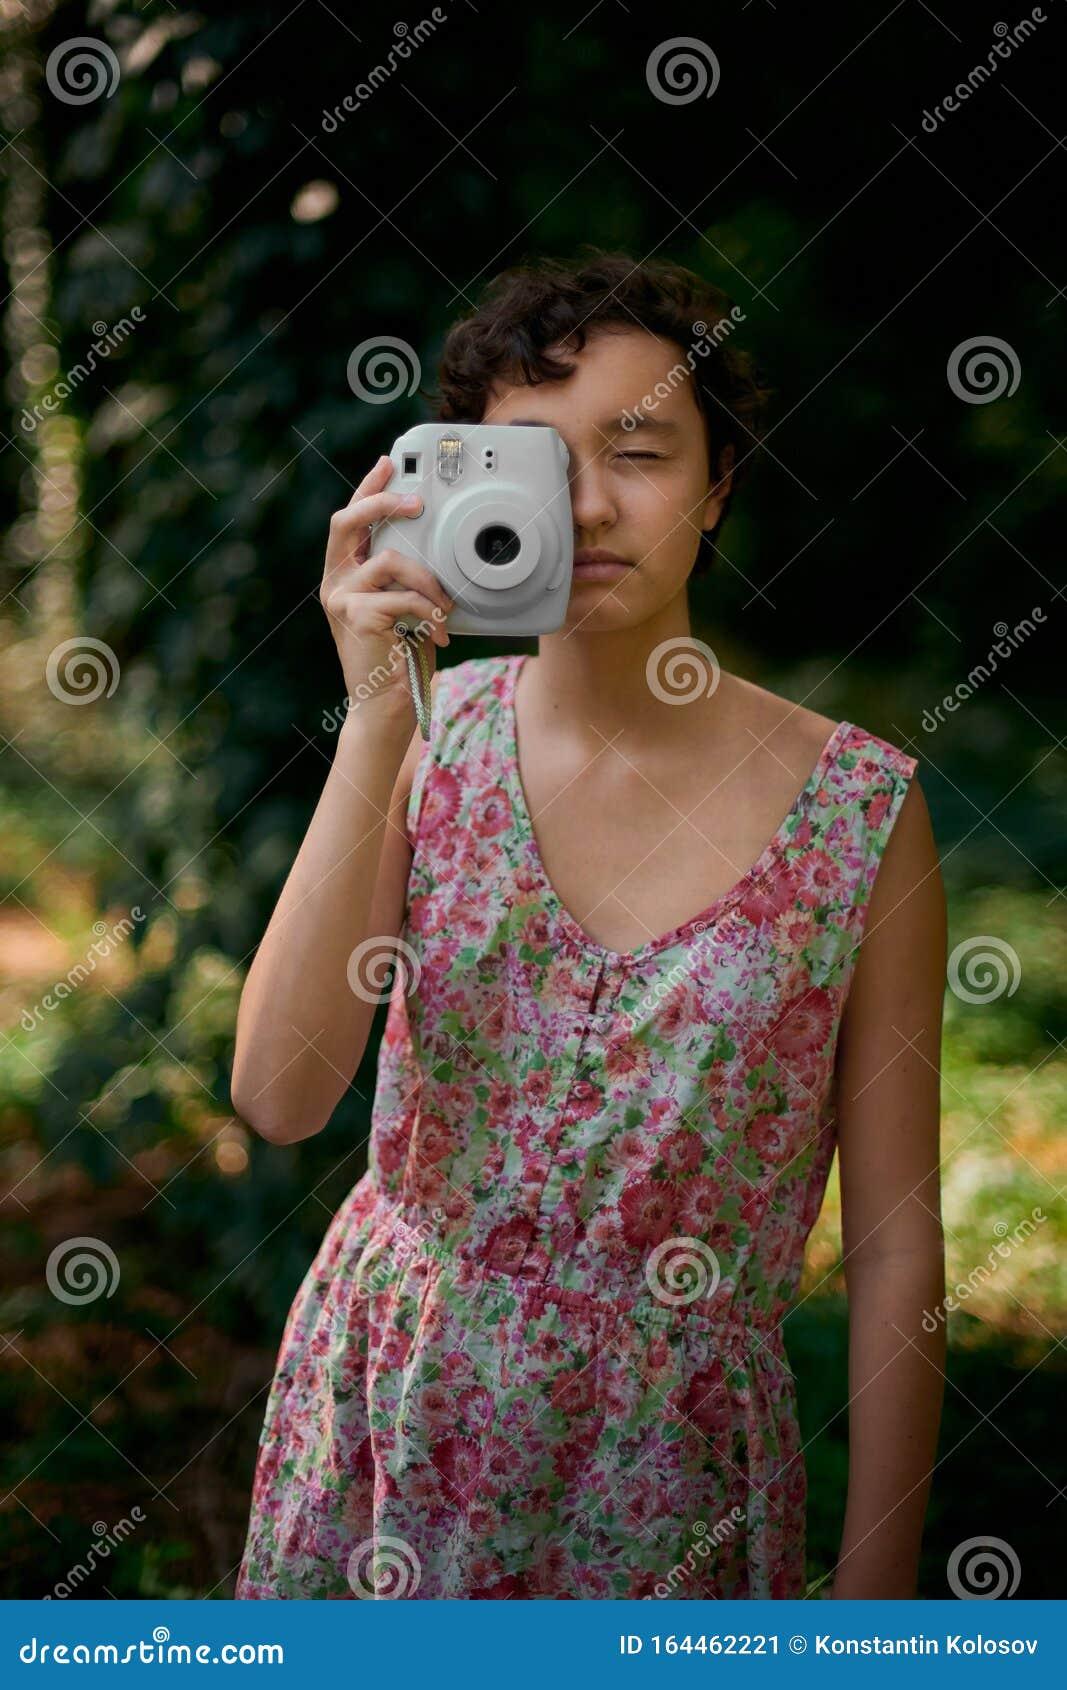 4,565 Preteen Girl Camera Photos - Free & Royalty-Free